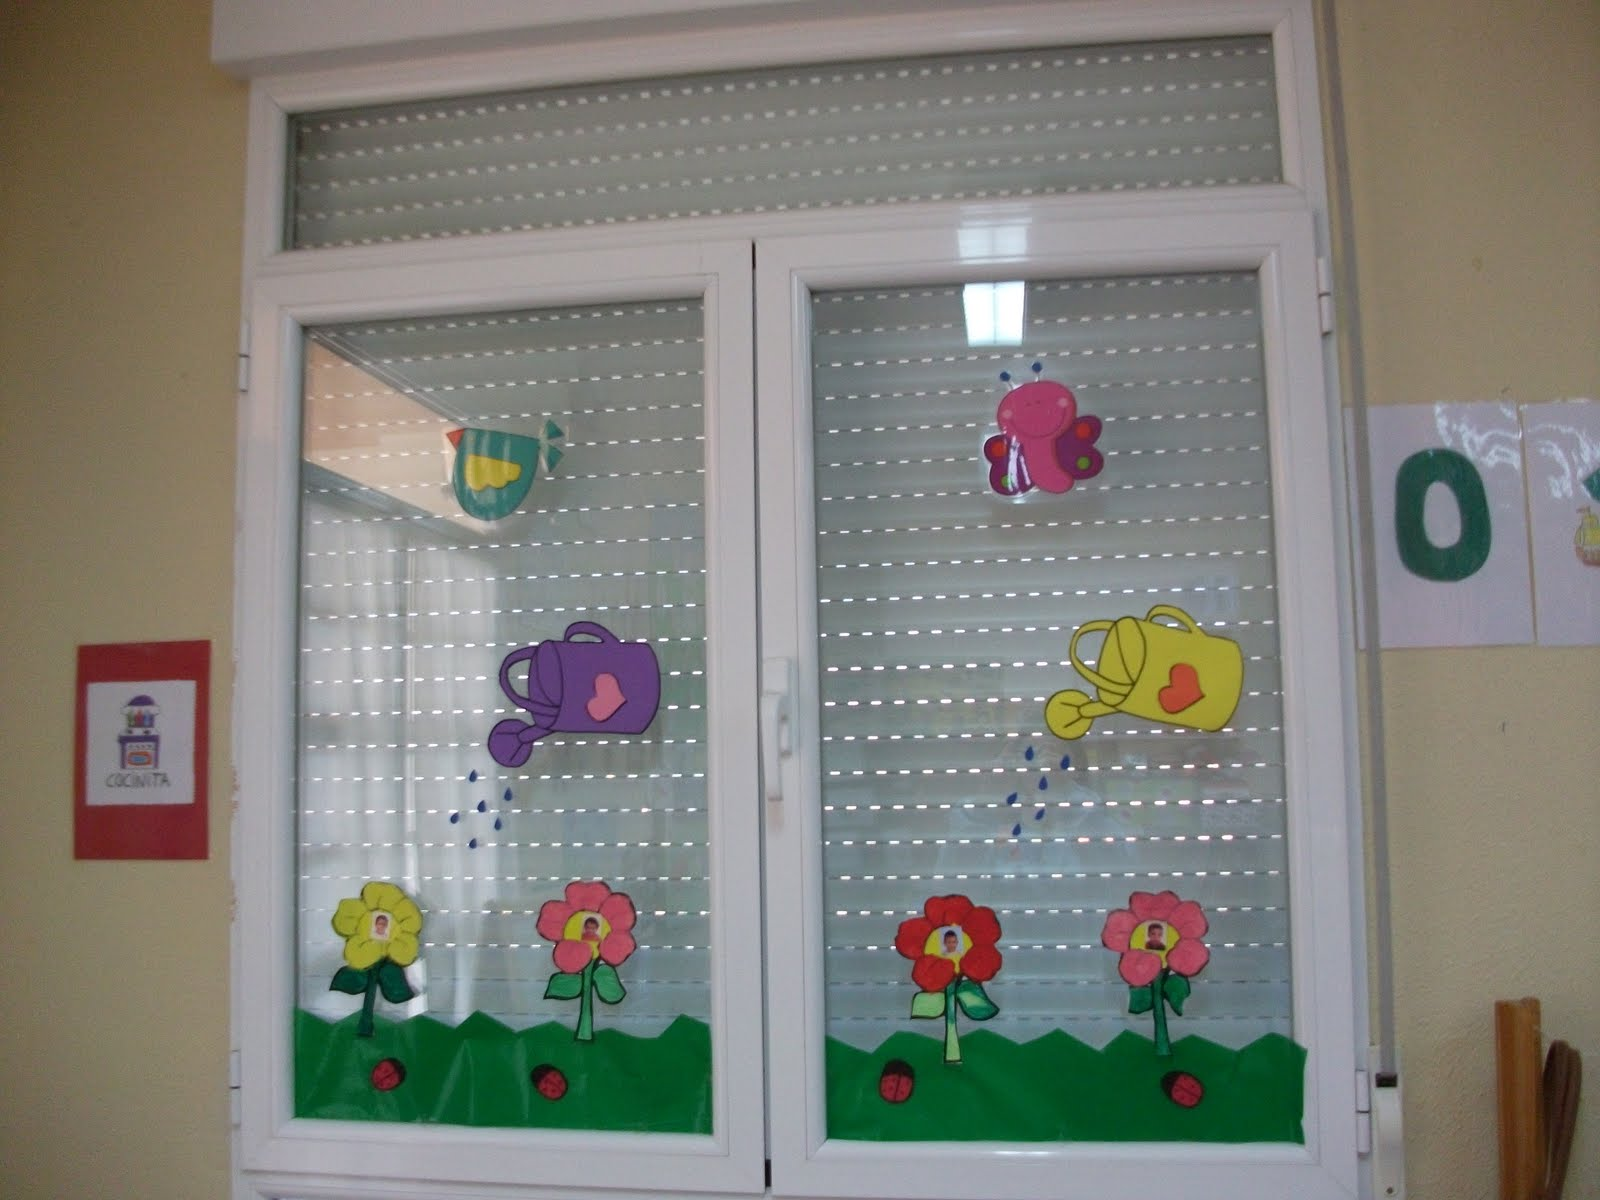 Puertas decoradas de primavera preescolar primavera for Puertas decoradas educacion infantil